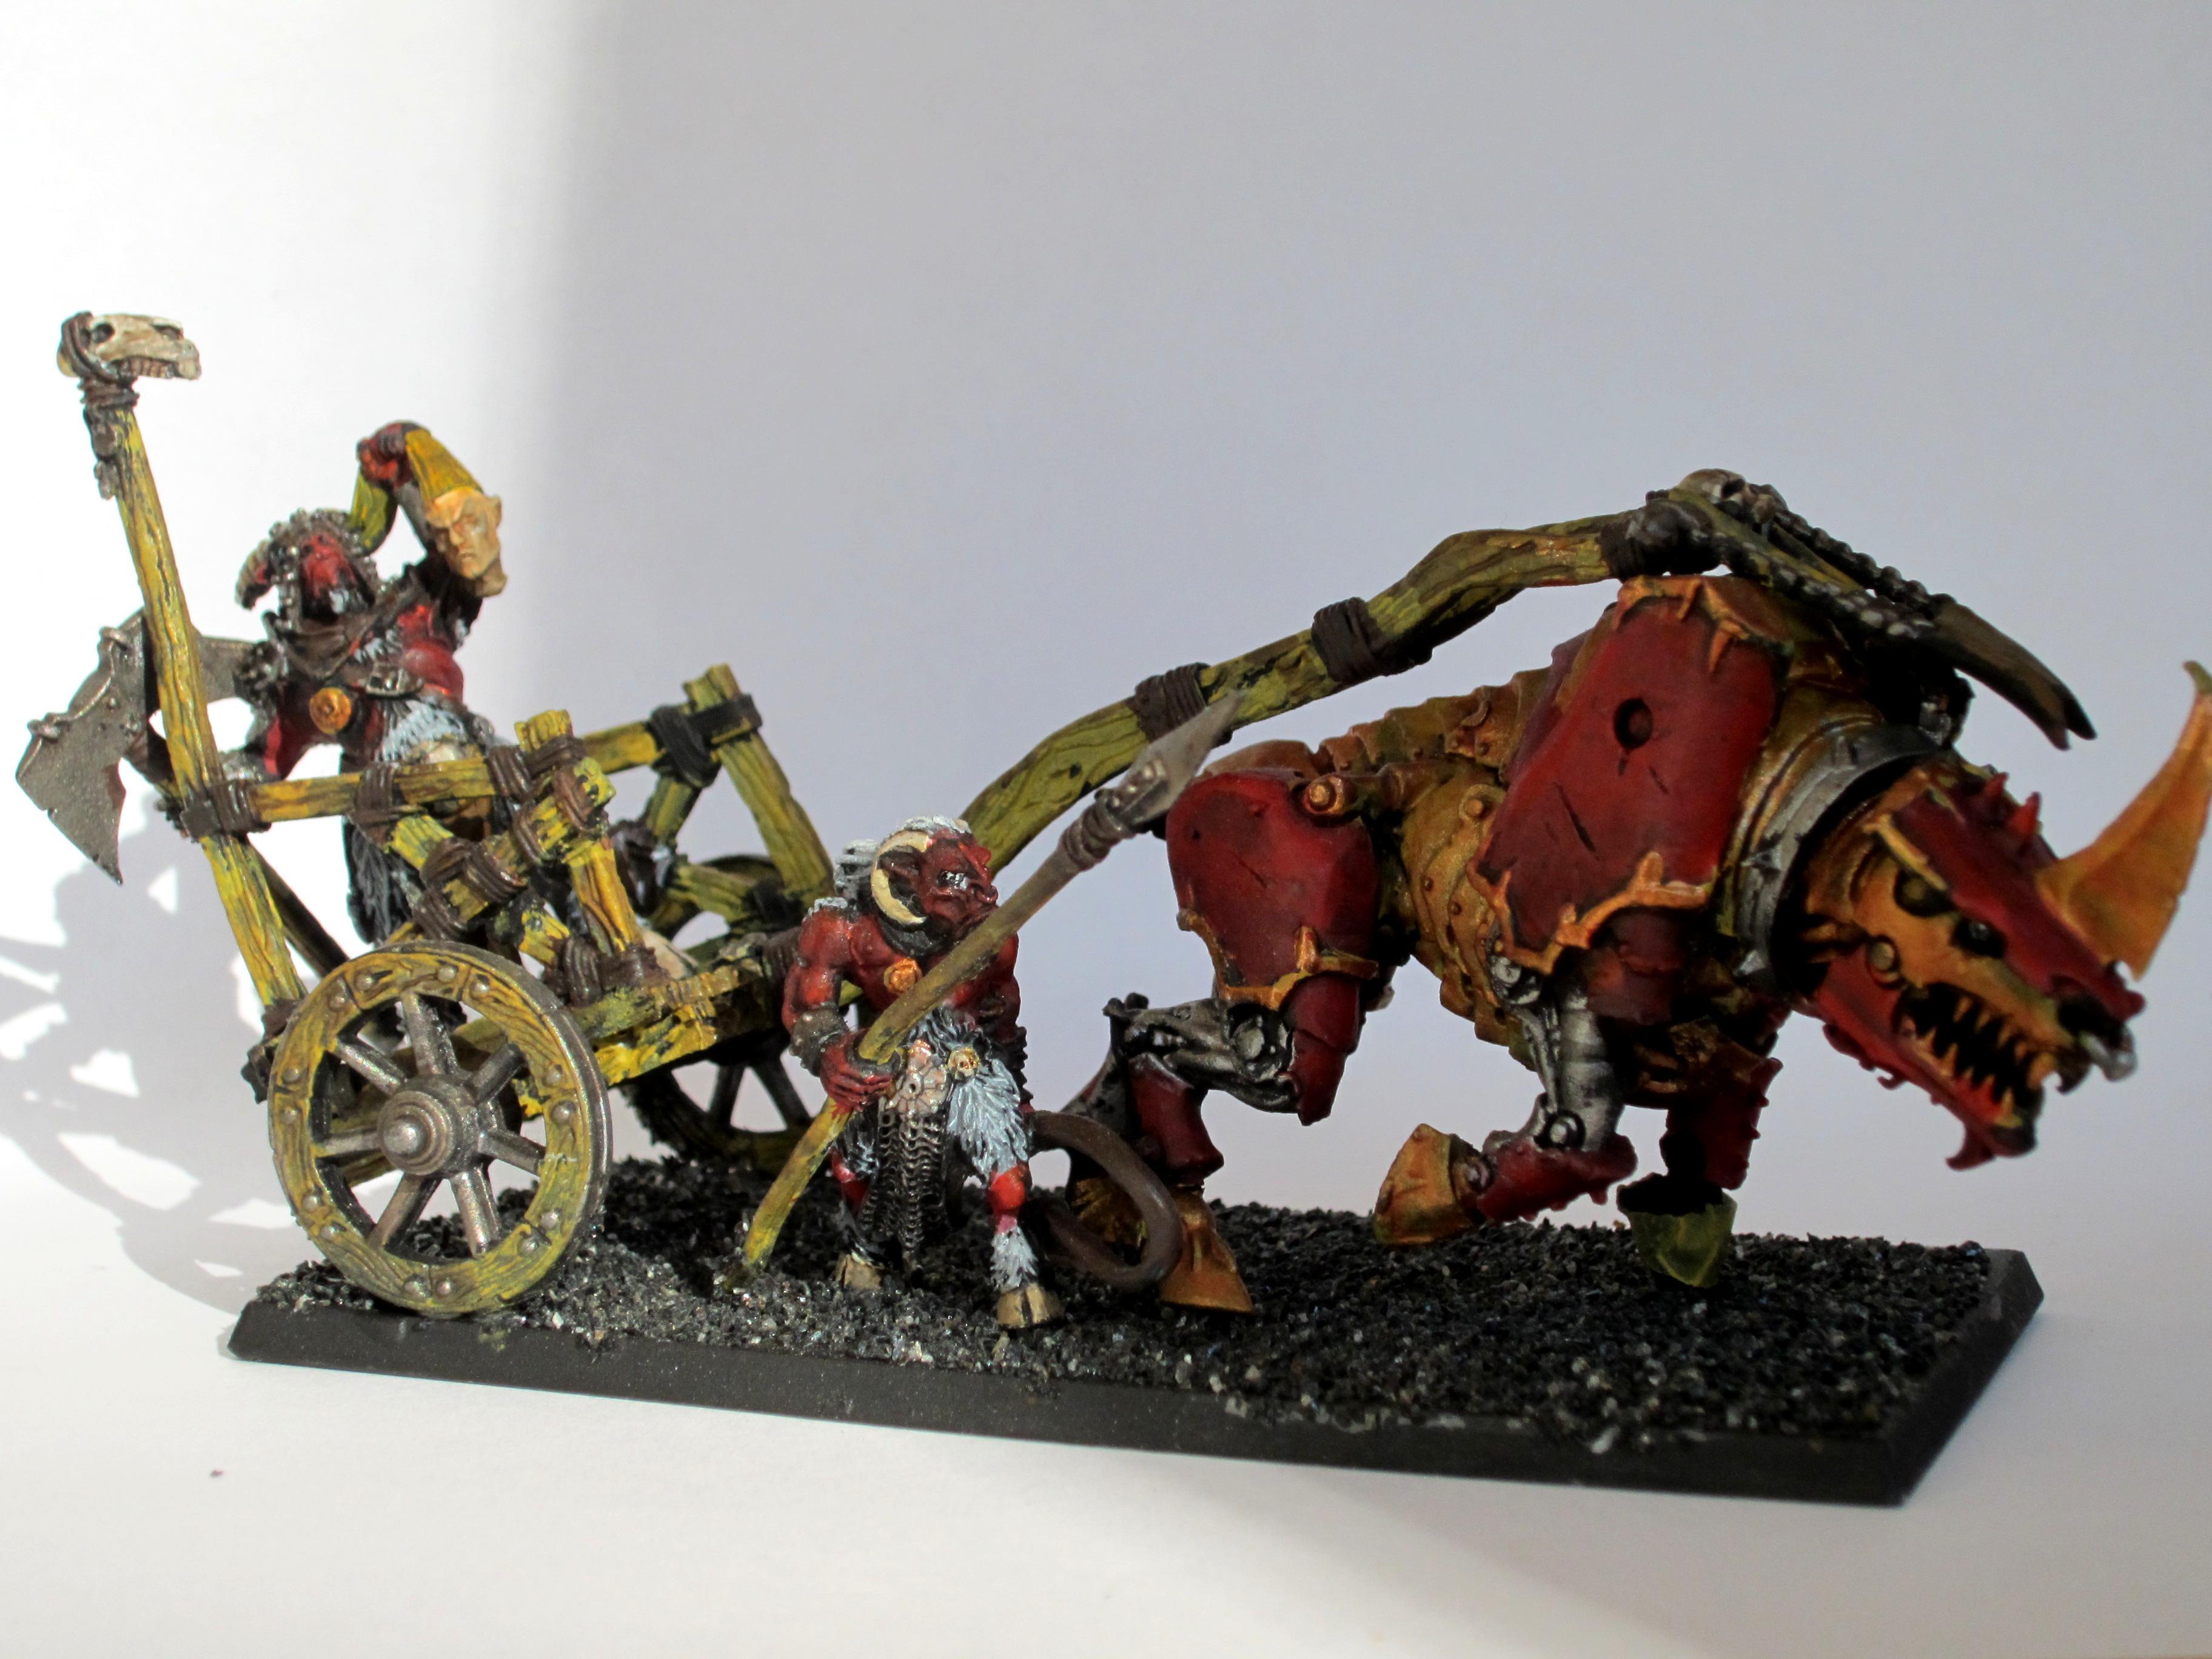 Beastmen, Chaos, Chariot, Khorne, Warhammer Fantasy